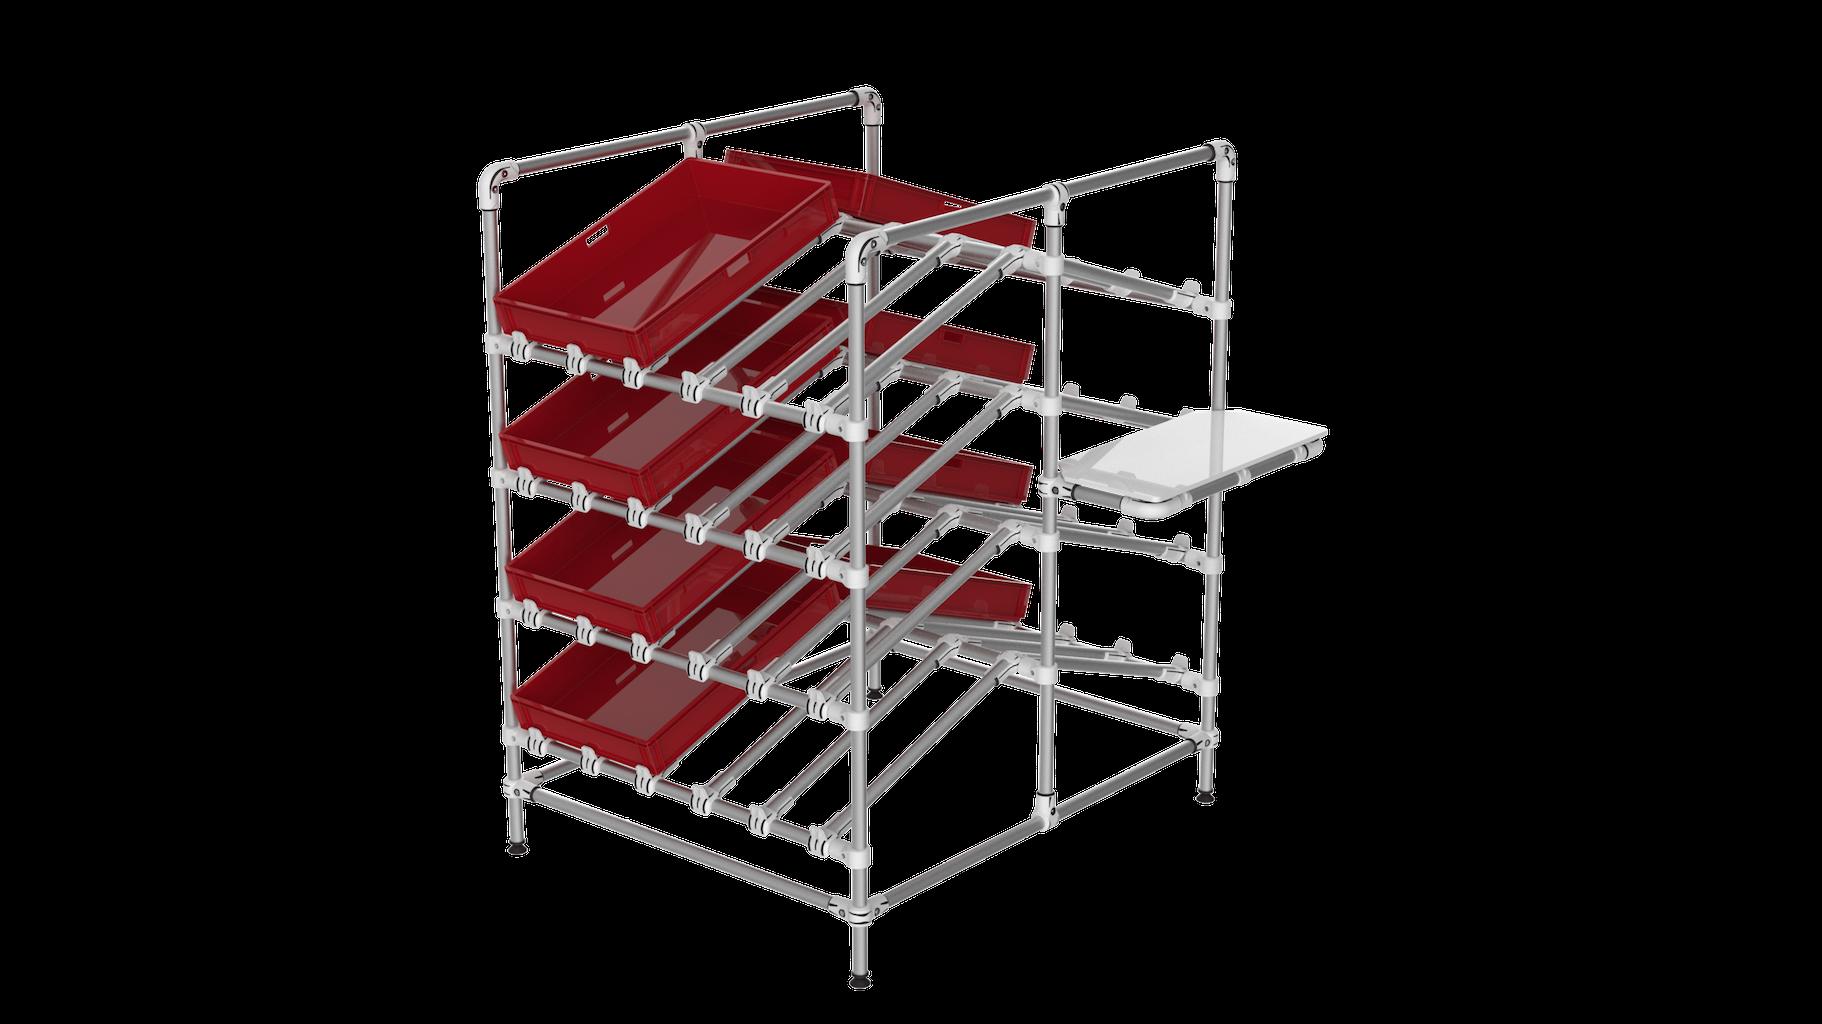 Double side box shelf